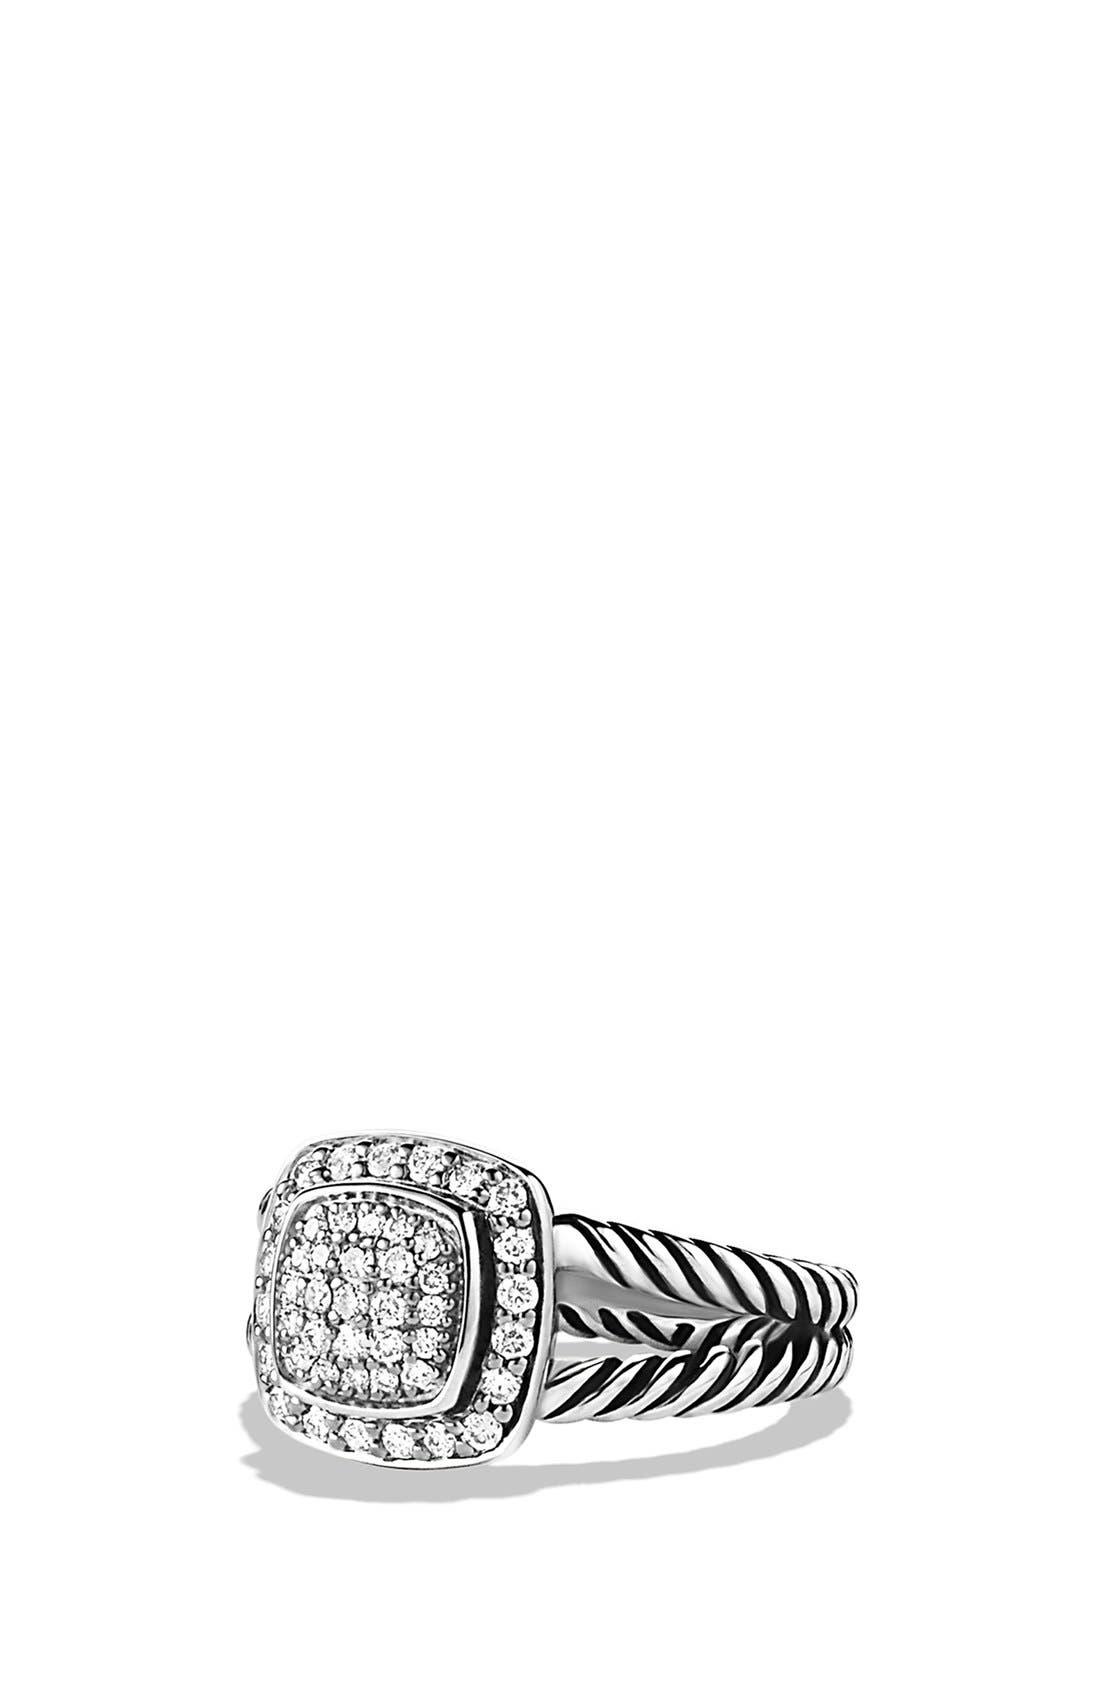 David Yurman 'Albion' Petite Ring with Diamonds